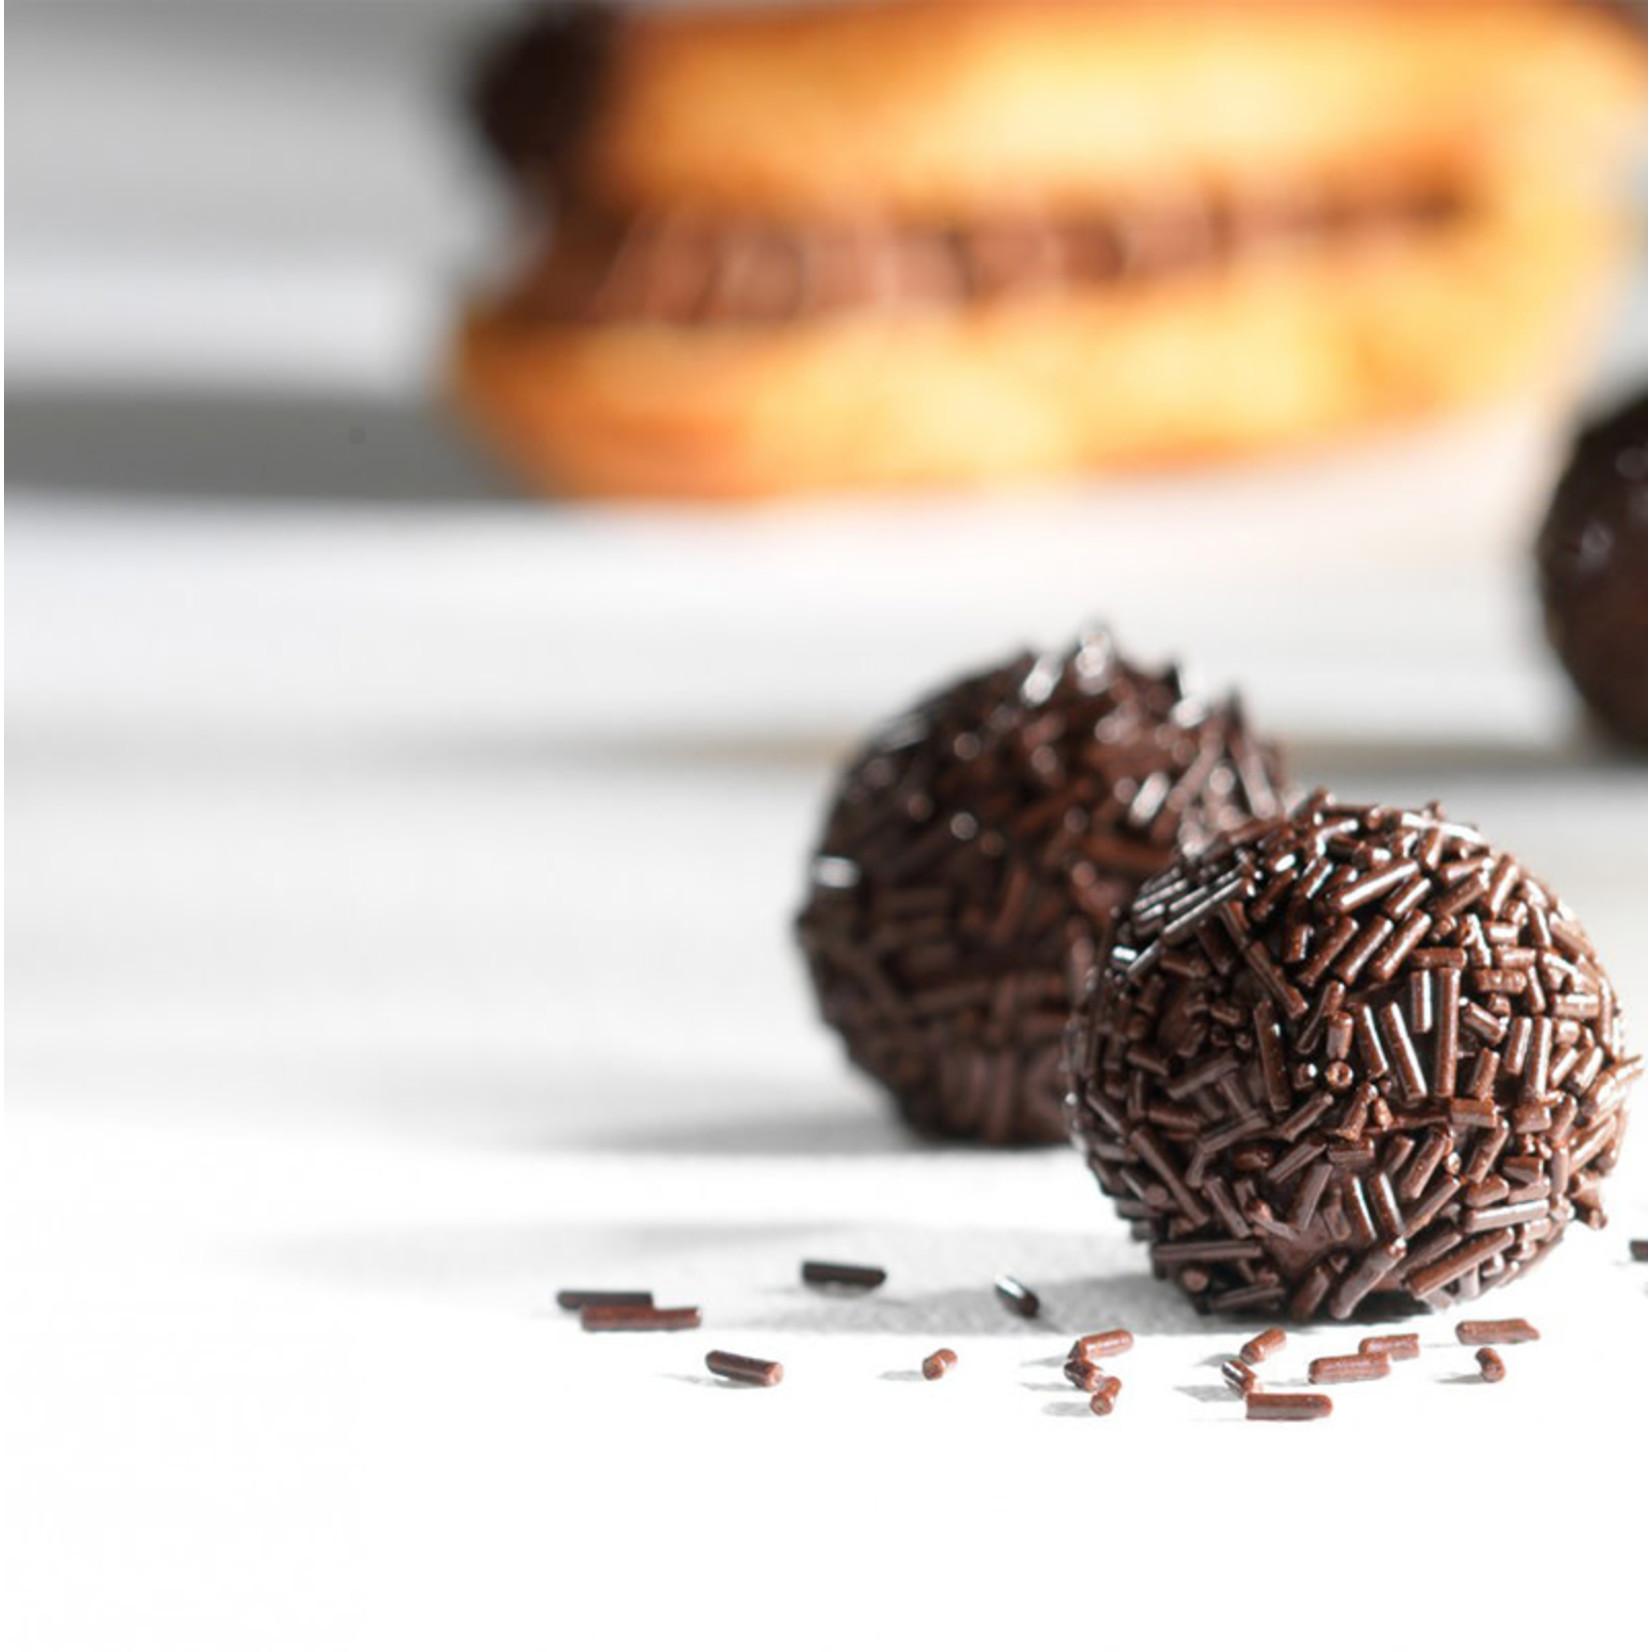 Cacao Barry Cacao Barry - Dark Chocolate Vermicelli - 1 kg/2.2 lb, M-7VCH-US-U73